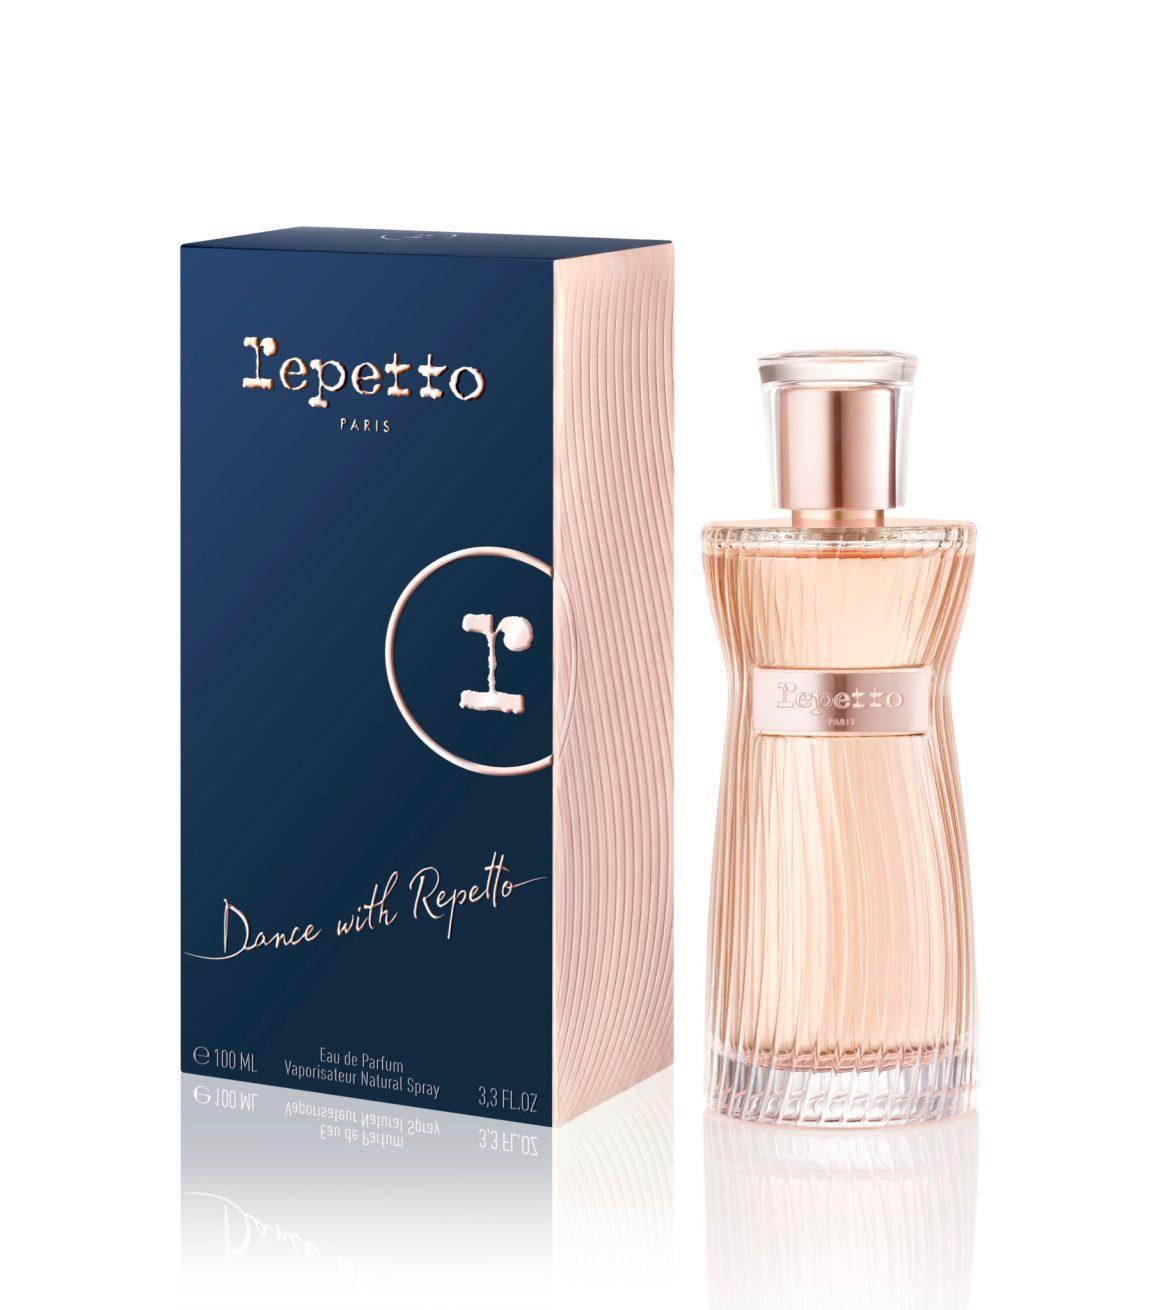 Dance With Repetto Le Nouveau Parfum Repetto Luxsure